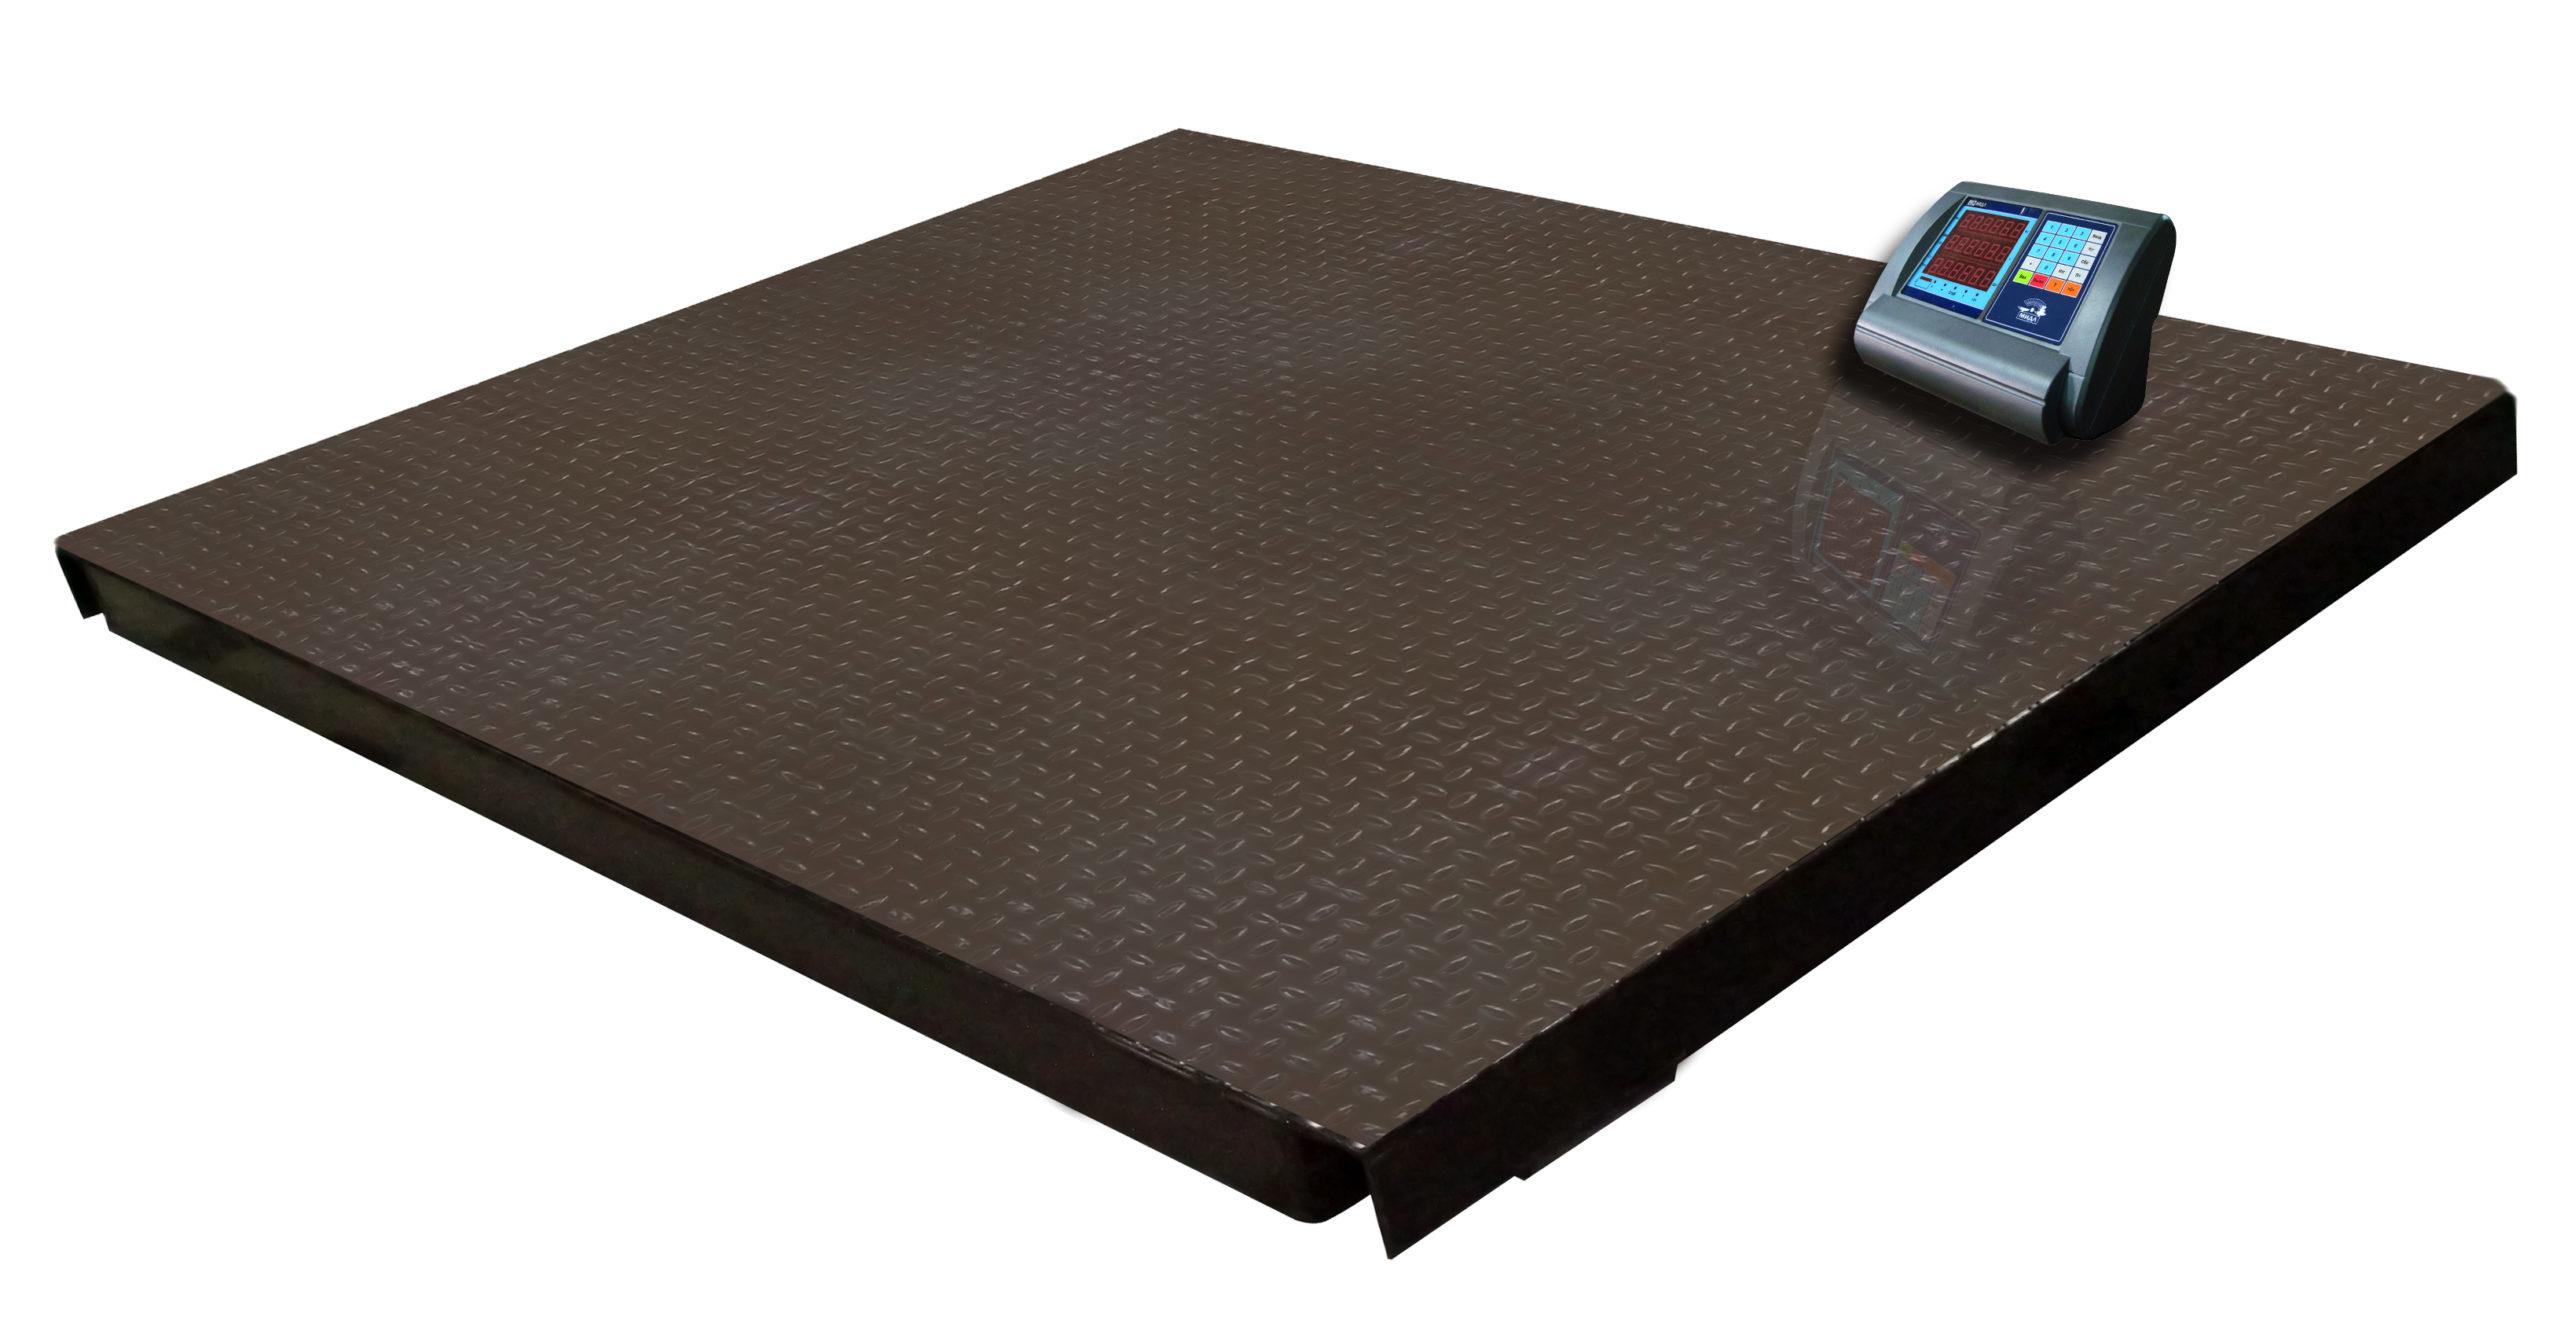 Платформенные весы МП 600 ВЕД(Ж)АФ1(100;1500х1500) циклоп 012С